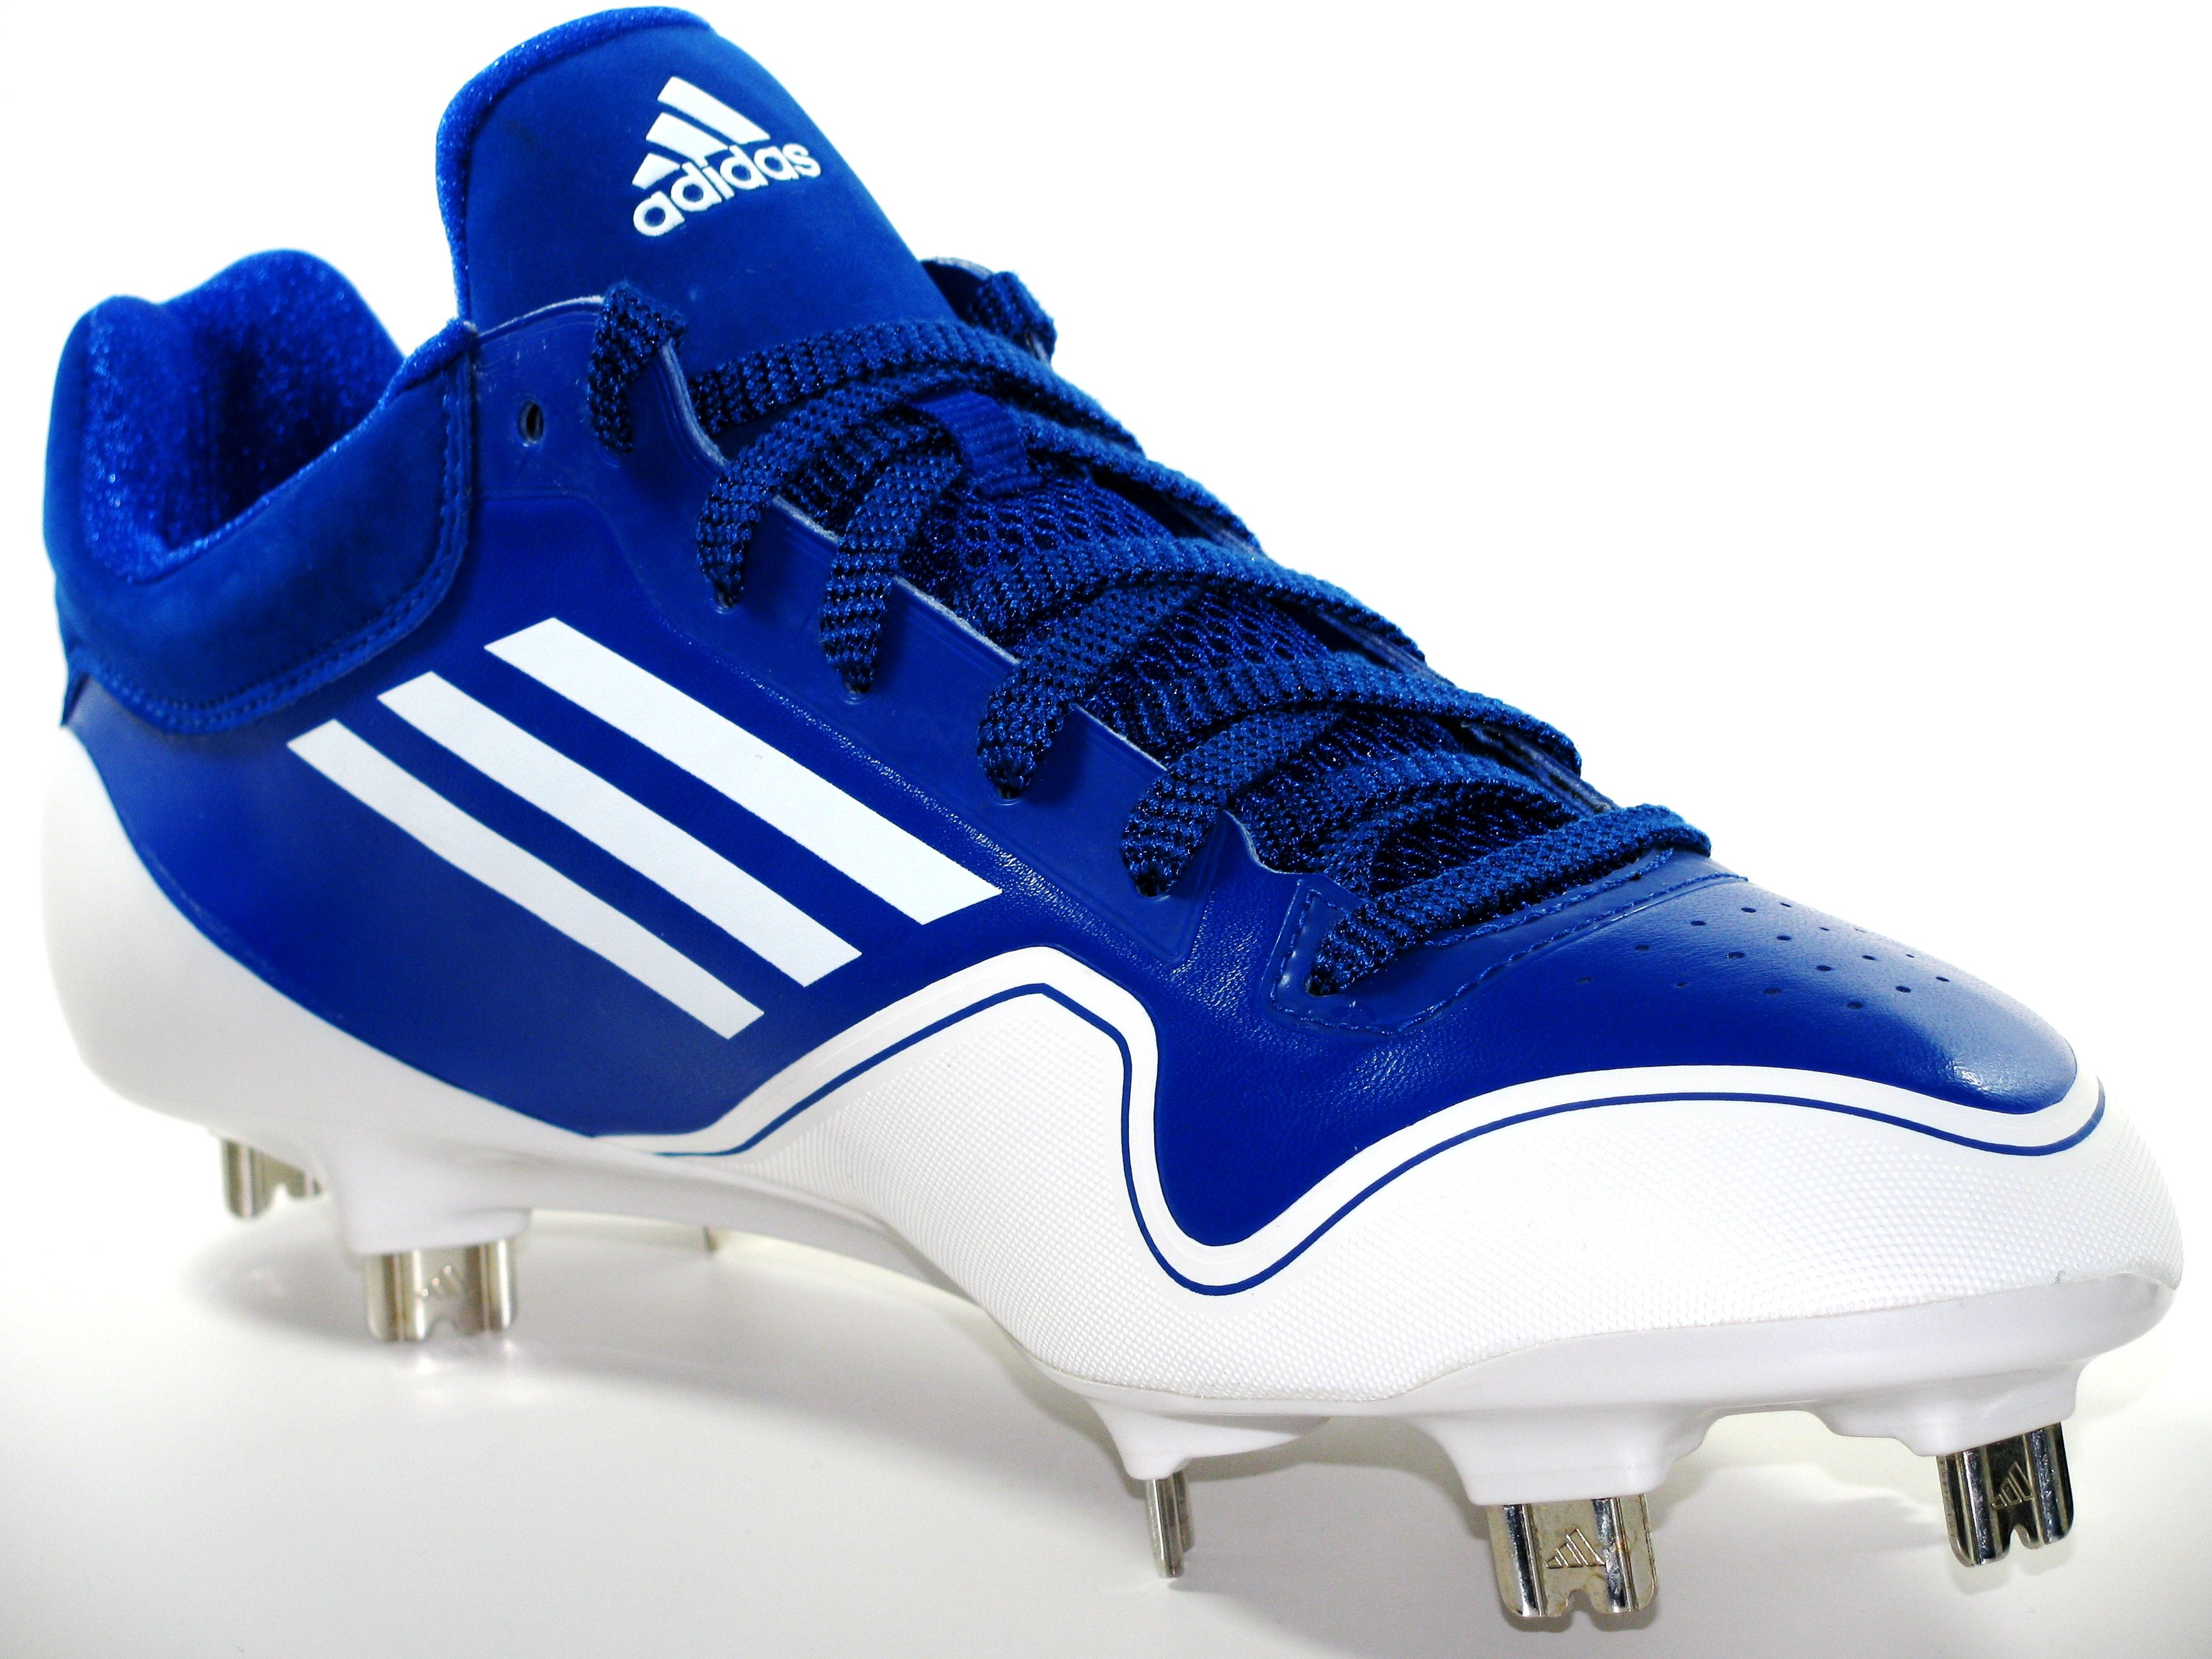 Adidas adizero 5tool metal baseball cleats metal